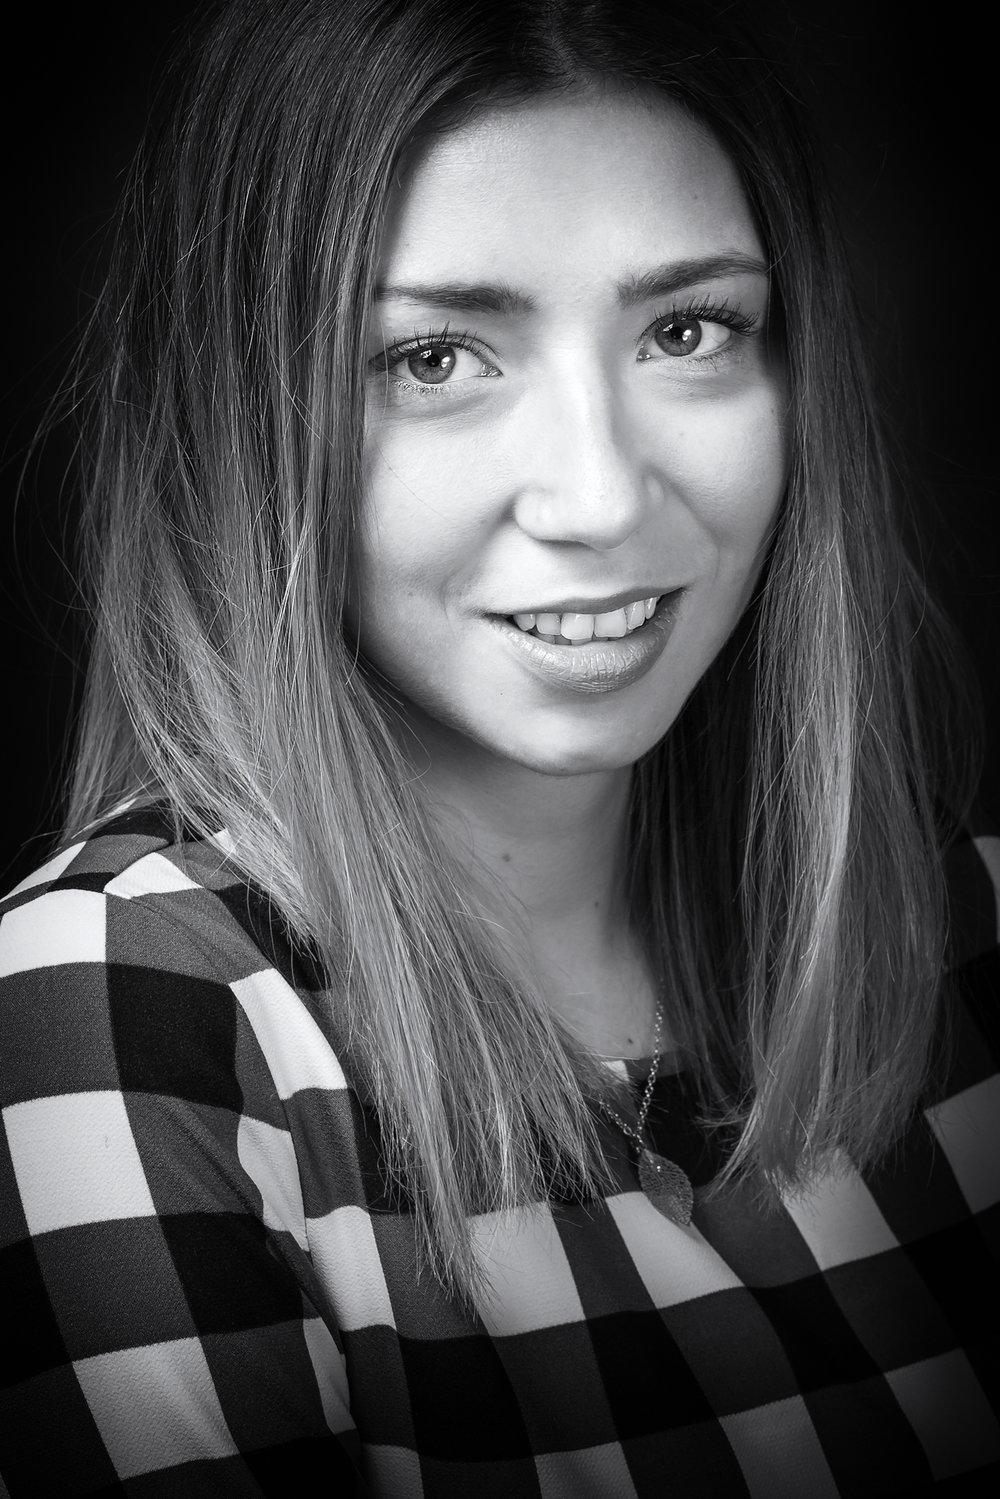 Alexandra Hannibalova